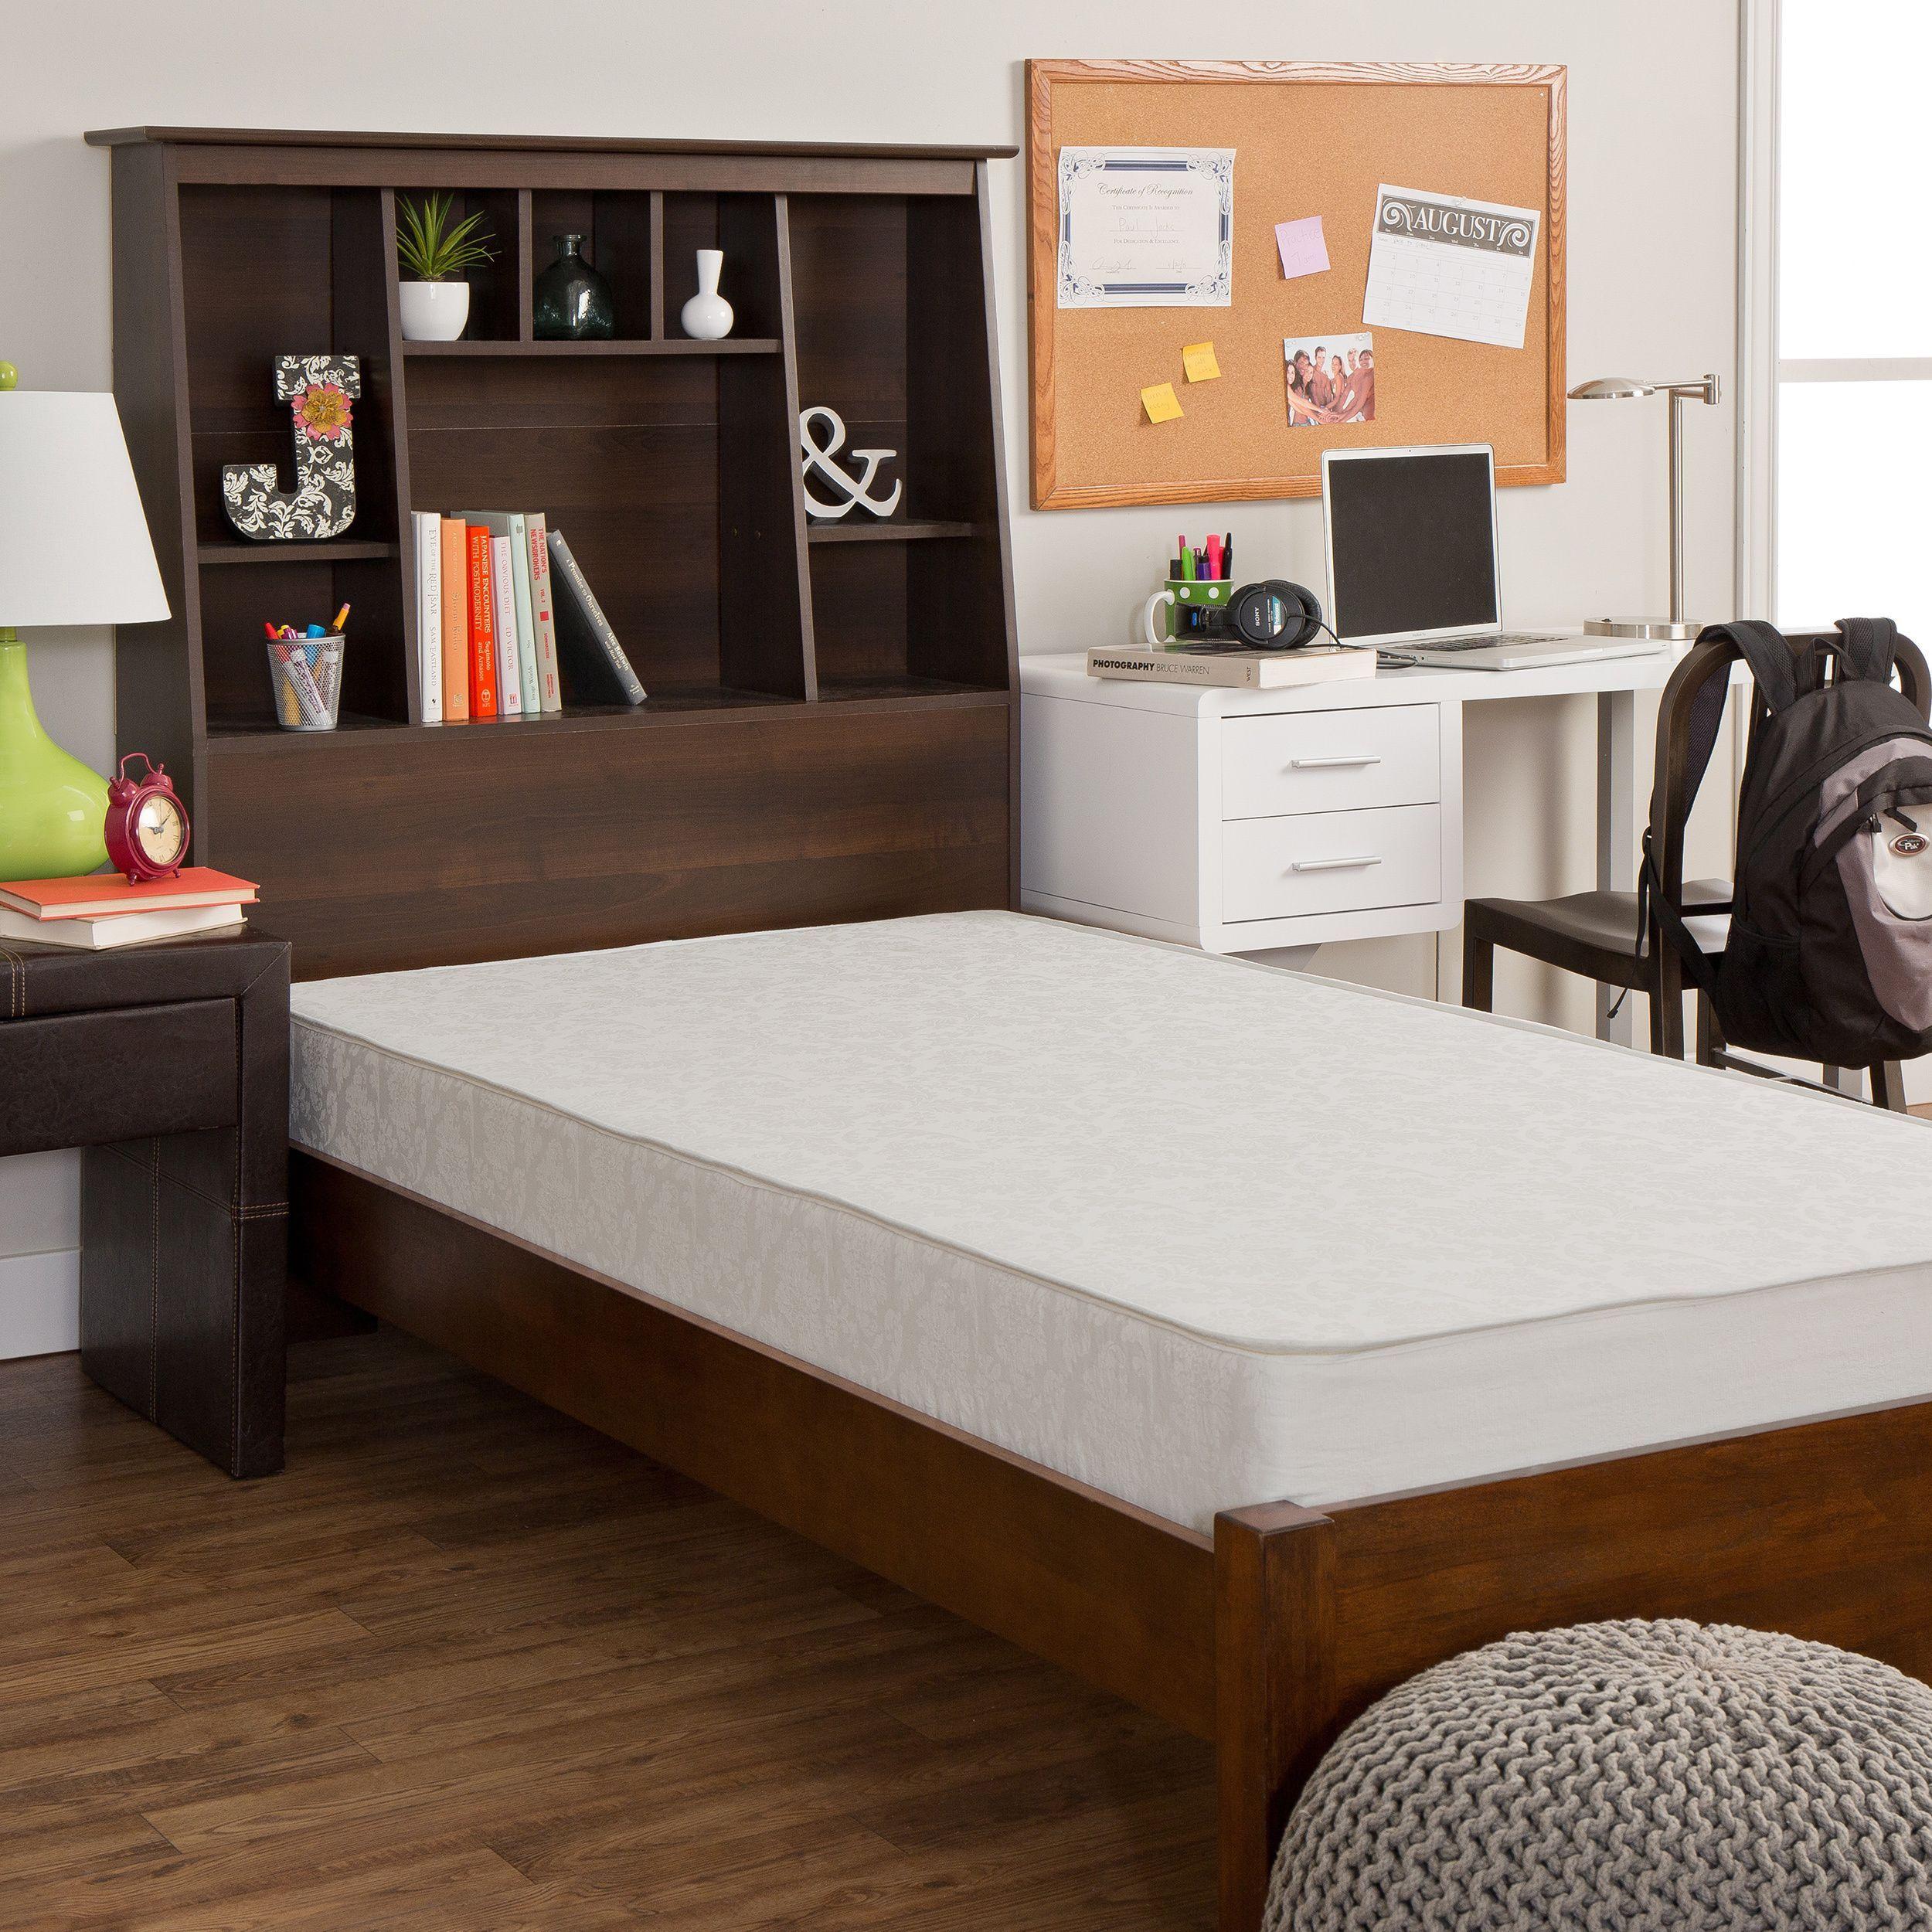 Select Luxury Dorm Flippable 7.5inch Medium Firm Full